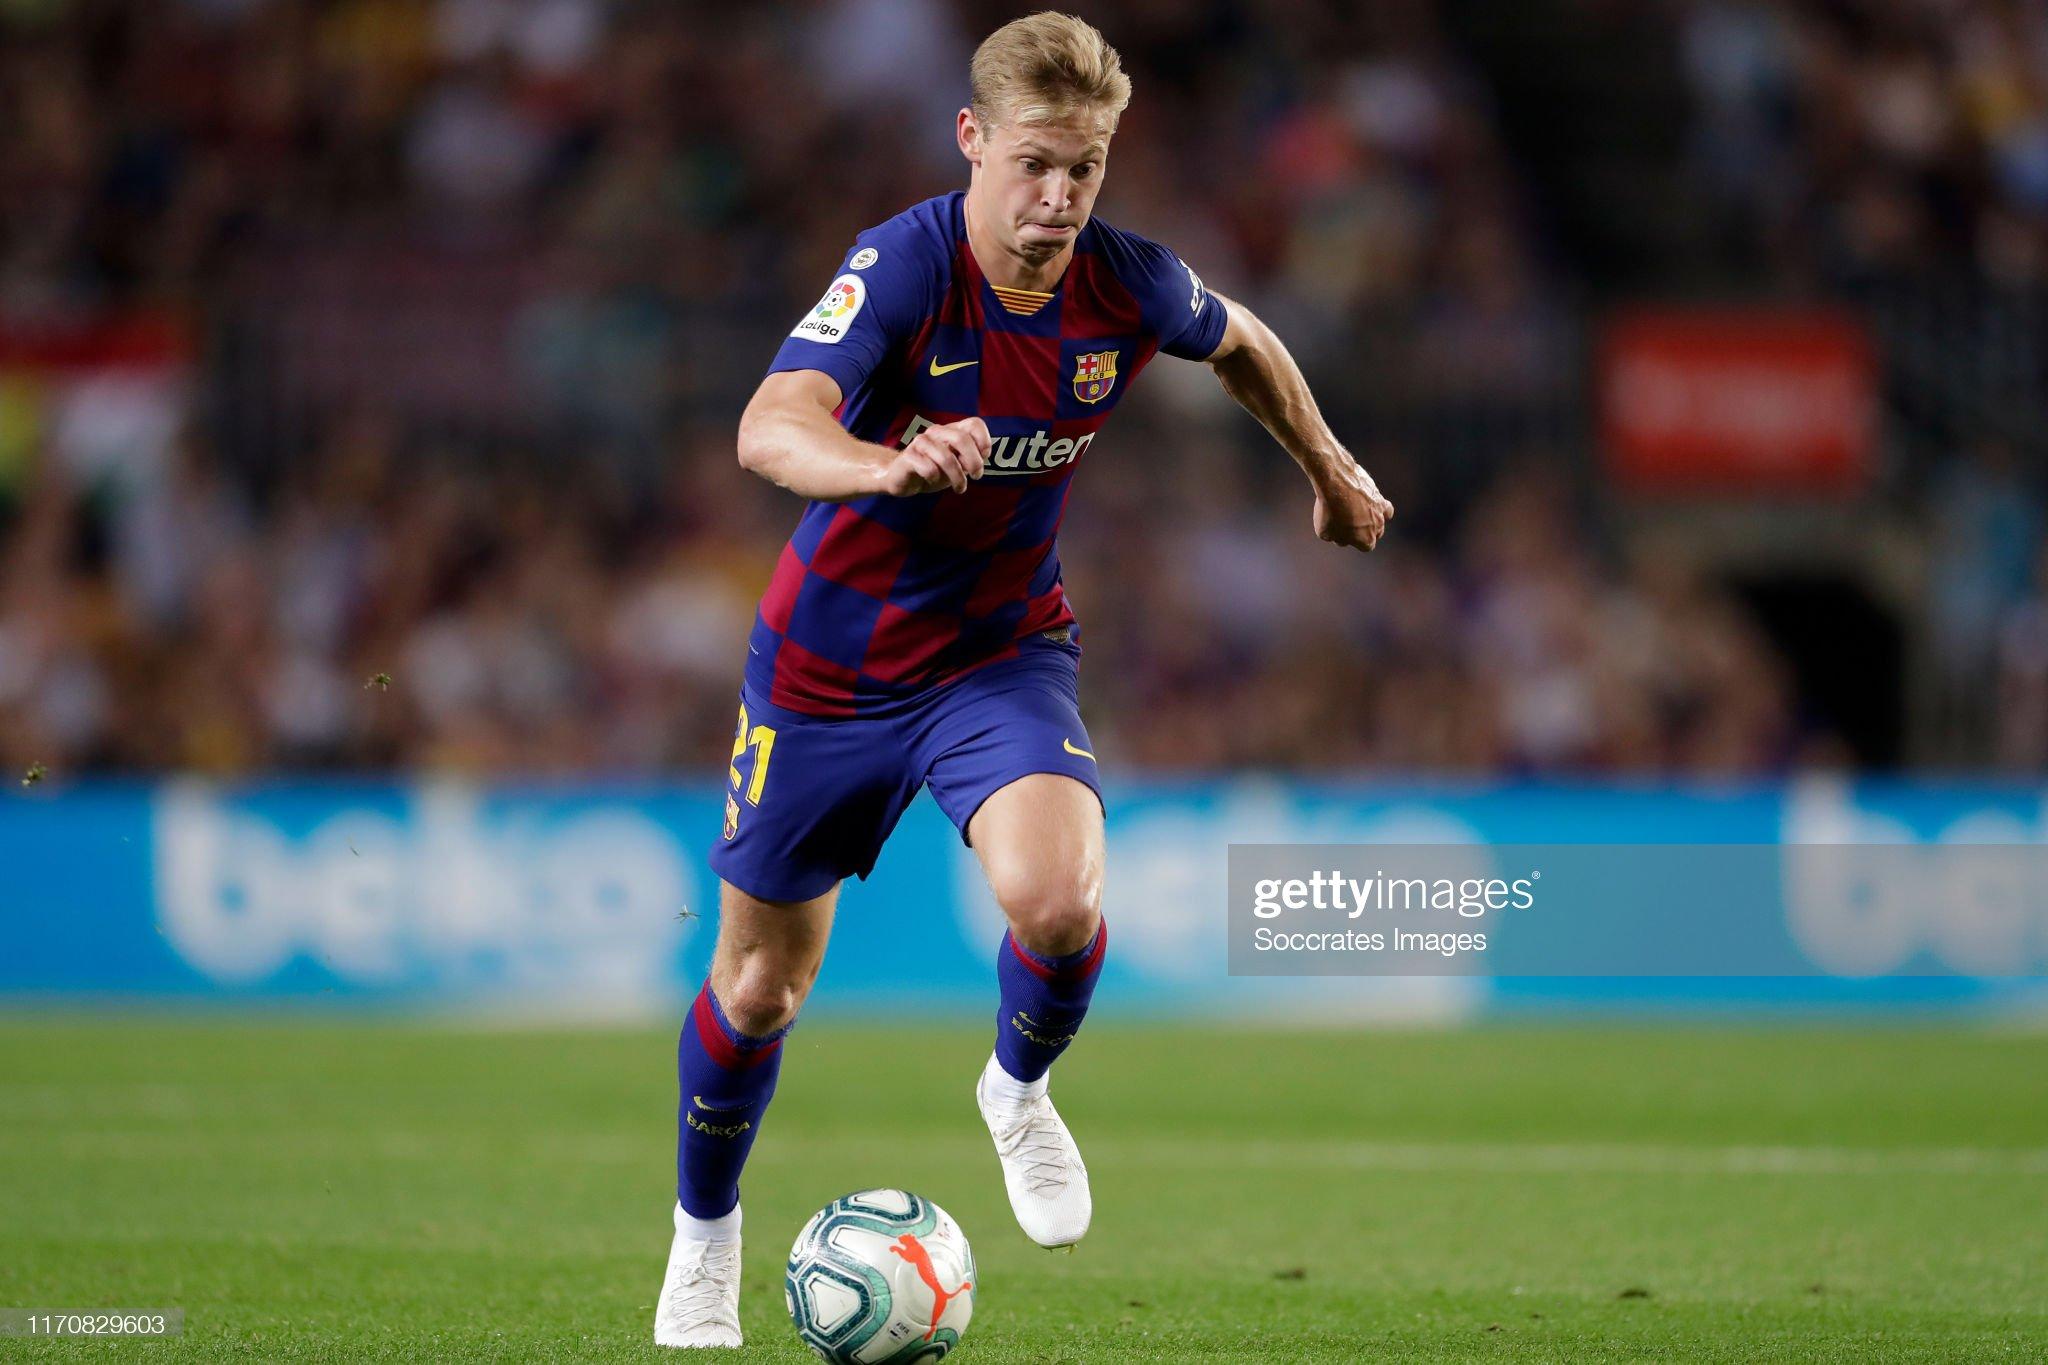 صور مباراة : برشلونة - فياريال 2-1 ( 24-09-2019 )  Frenkie-de-jong-of-fc-barcelona-during-the-la-liga-santander-match-picture-id1170829603?s=2048x2048